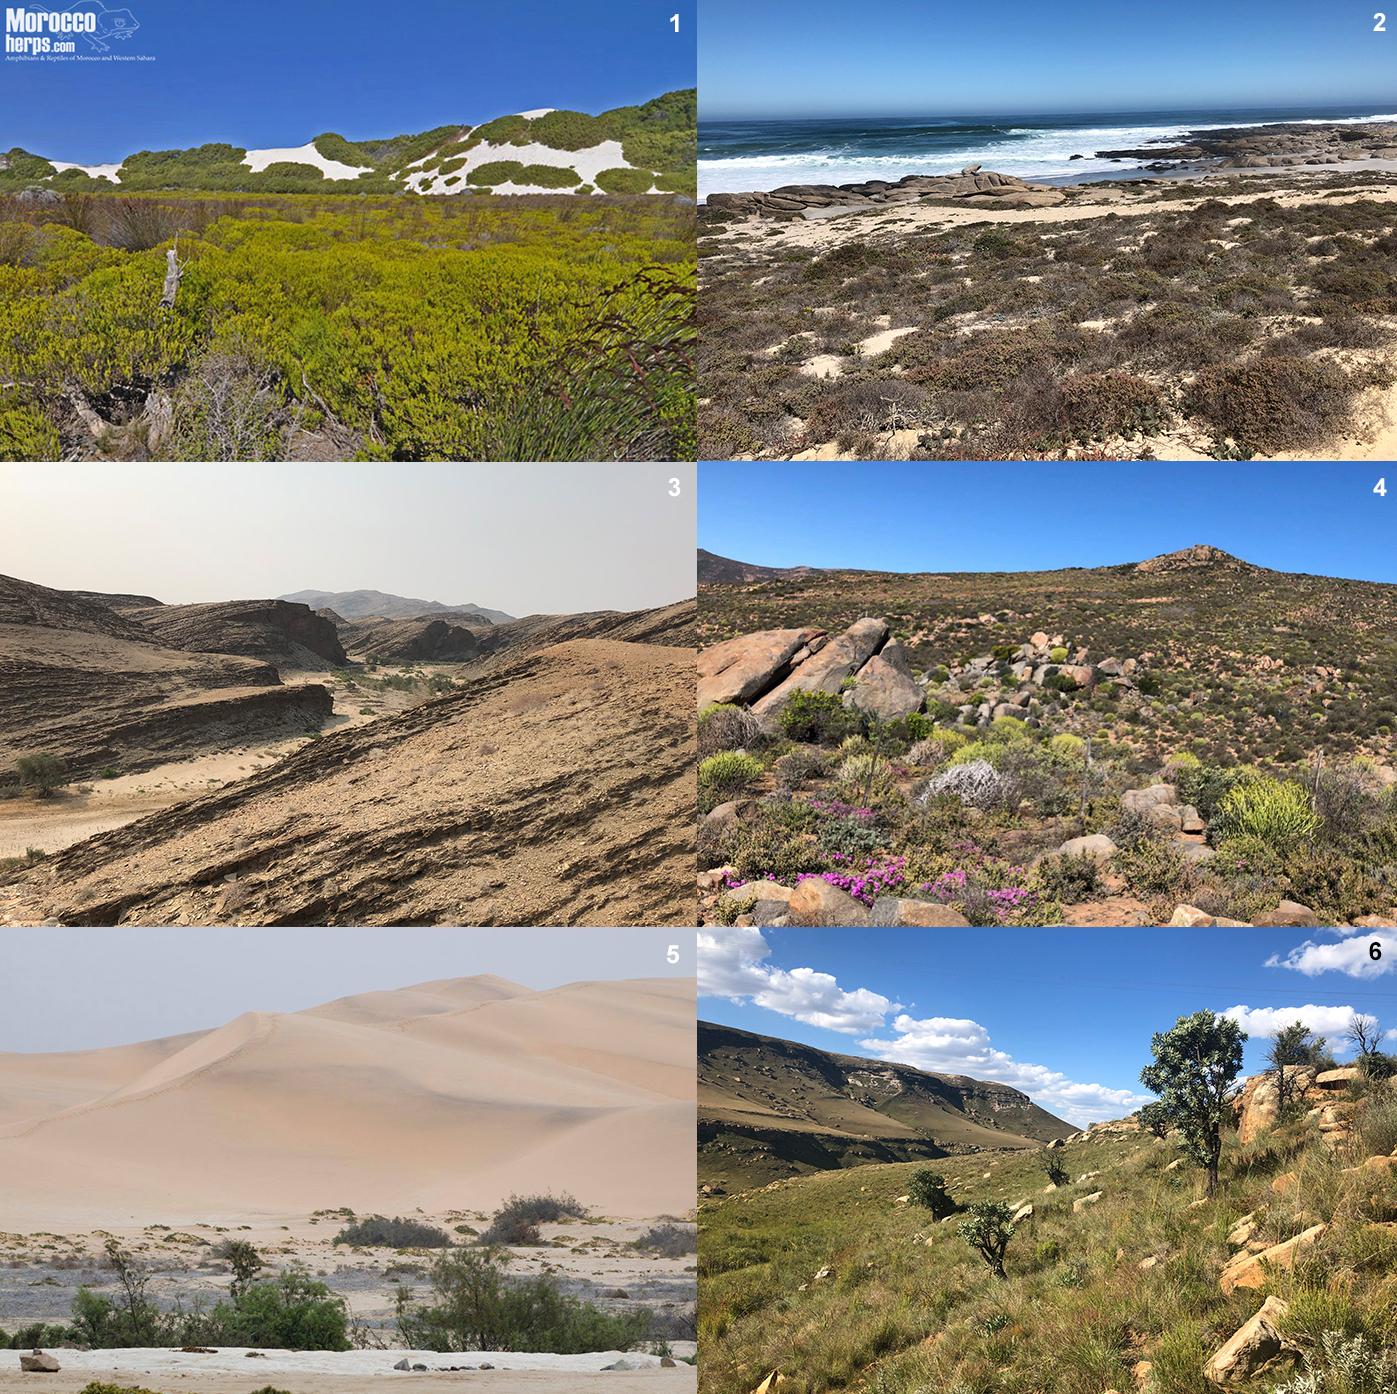 habitat-calechidna-fynbos-namaqualand-namibia-atropos-caudalis-cornuta-peringueyi-schneideri